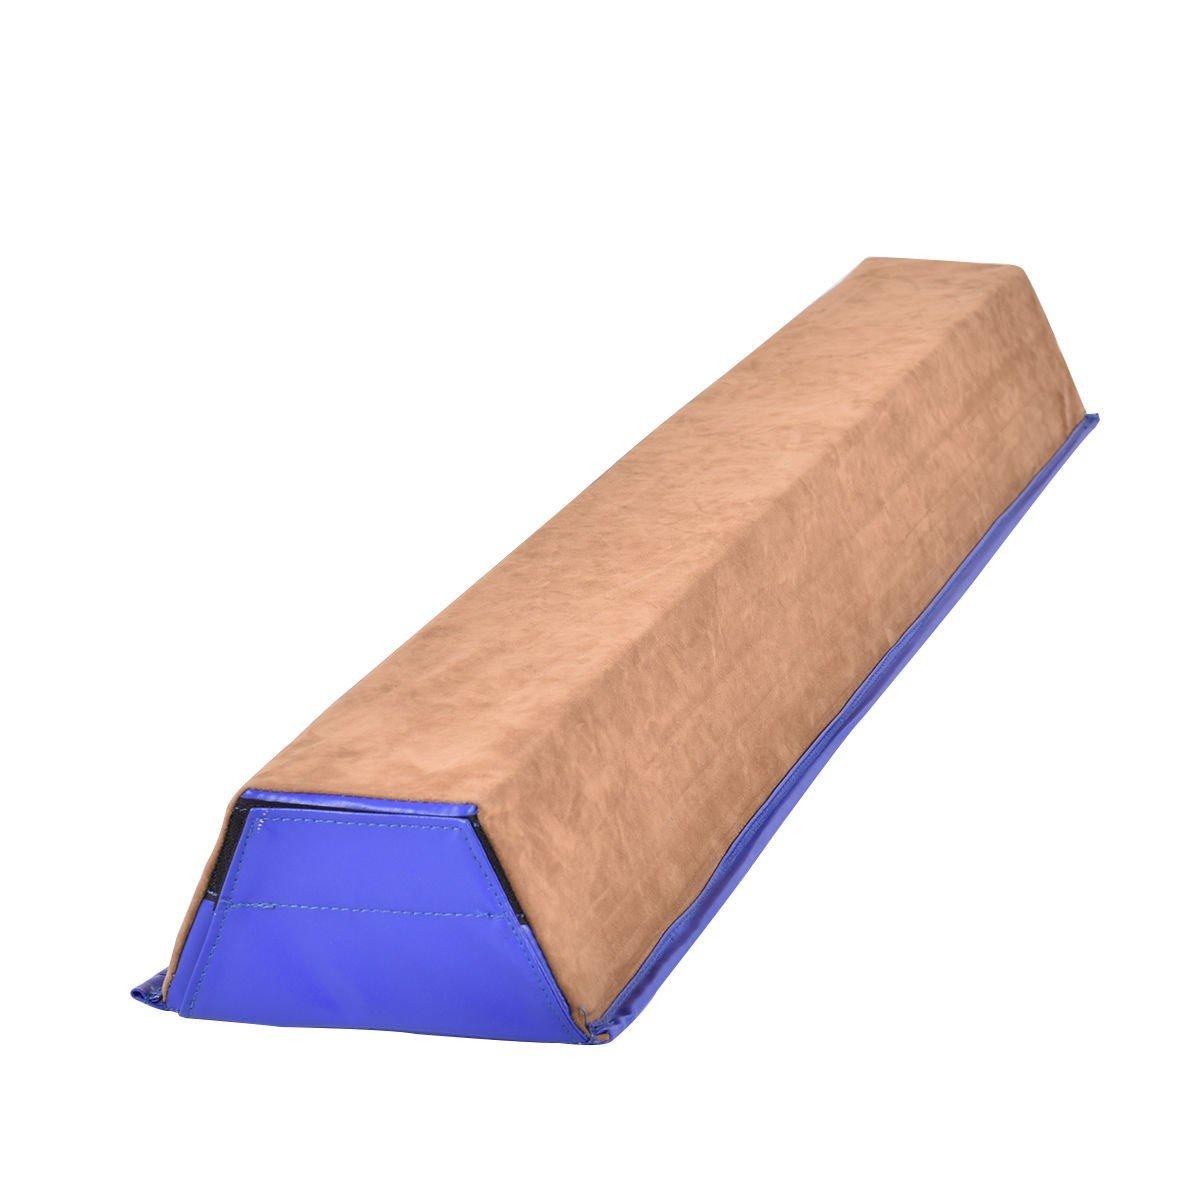 MyEasyShopping 4' Sectional Floor Trapezoid Gymnastics Balance Beam Balance Beam Sectional Trapezoid Floor Gymnastics Training 4 Folding Practice